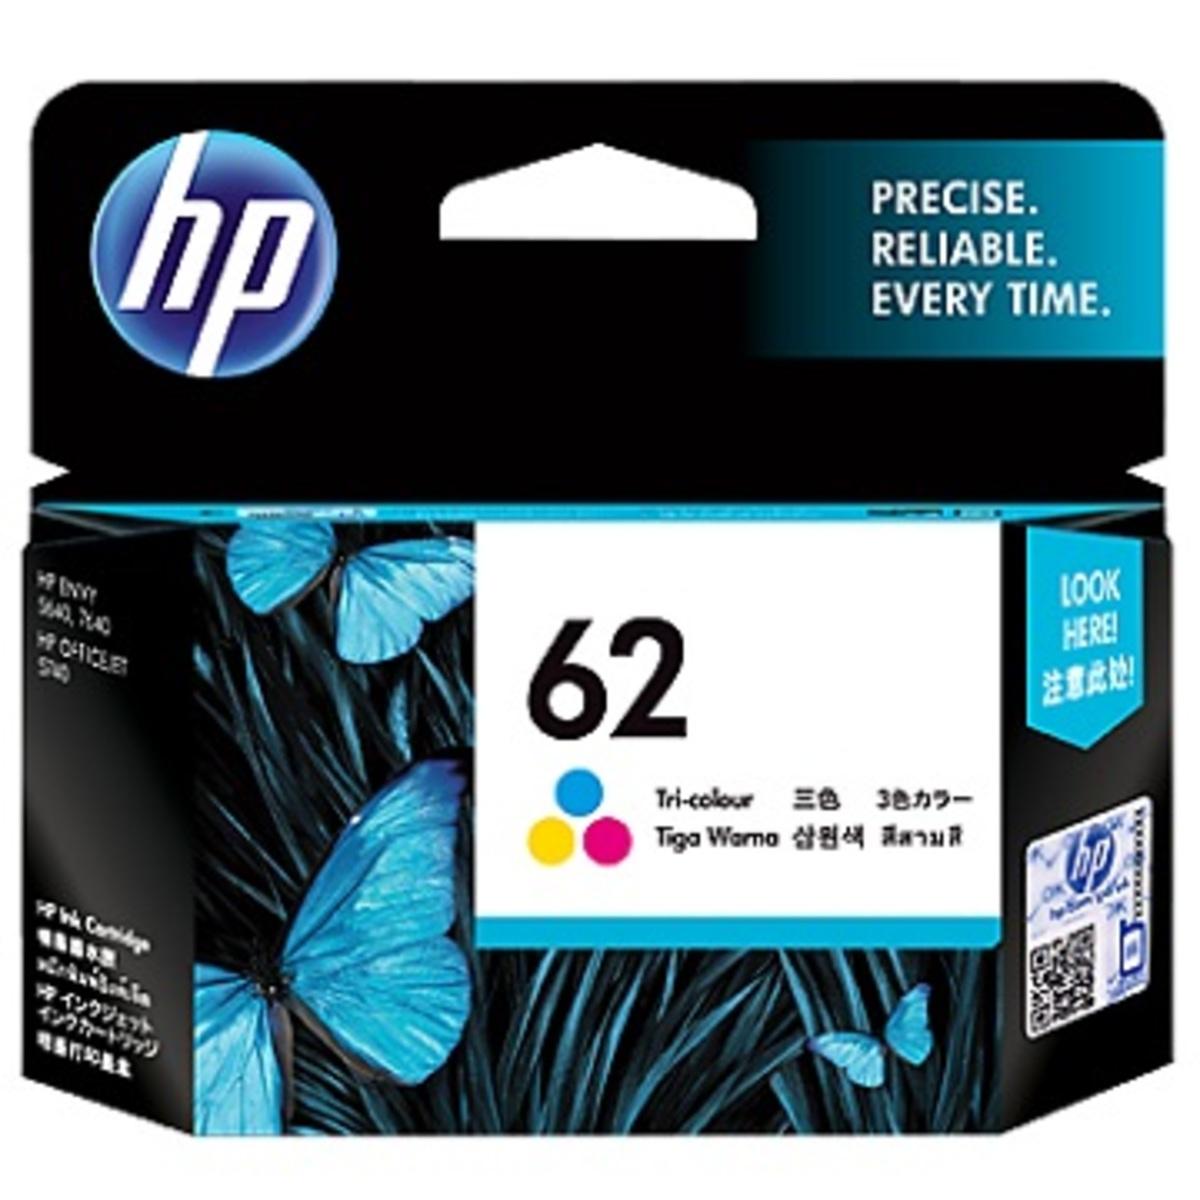 HP 62 COLOR INK